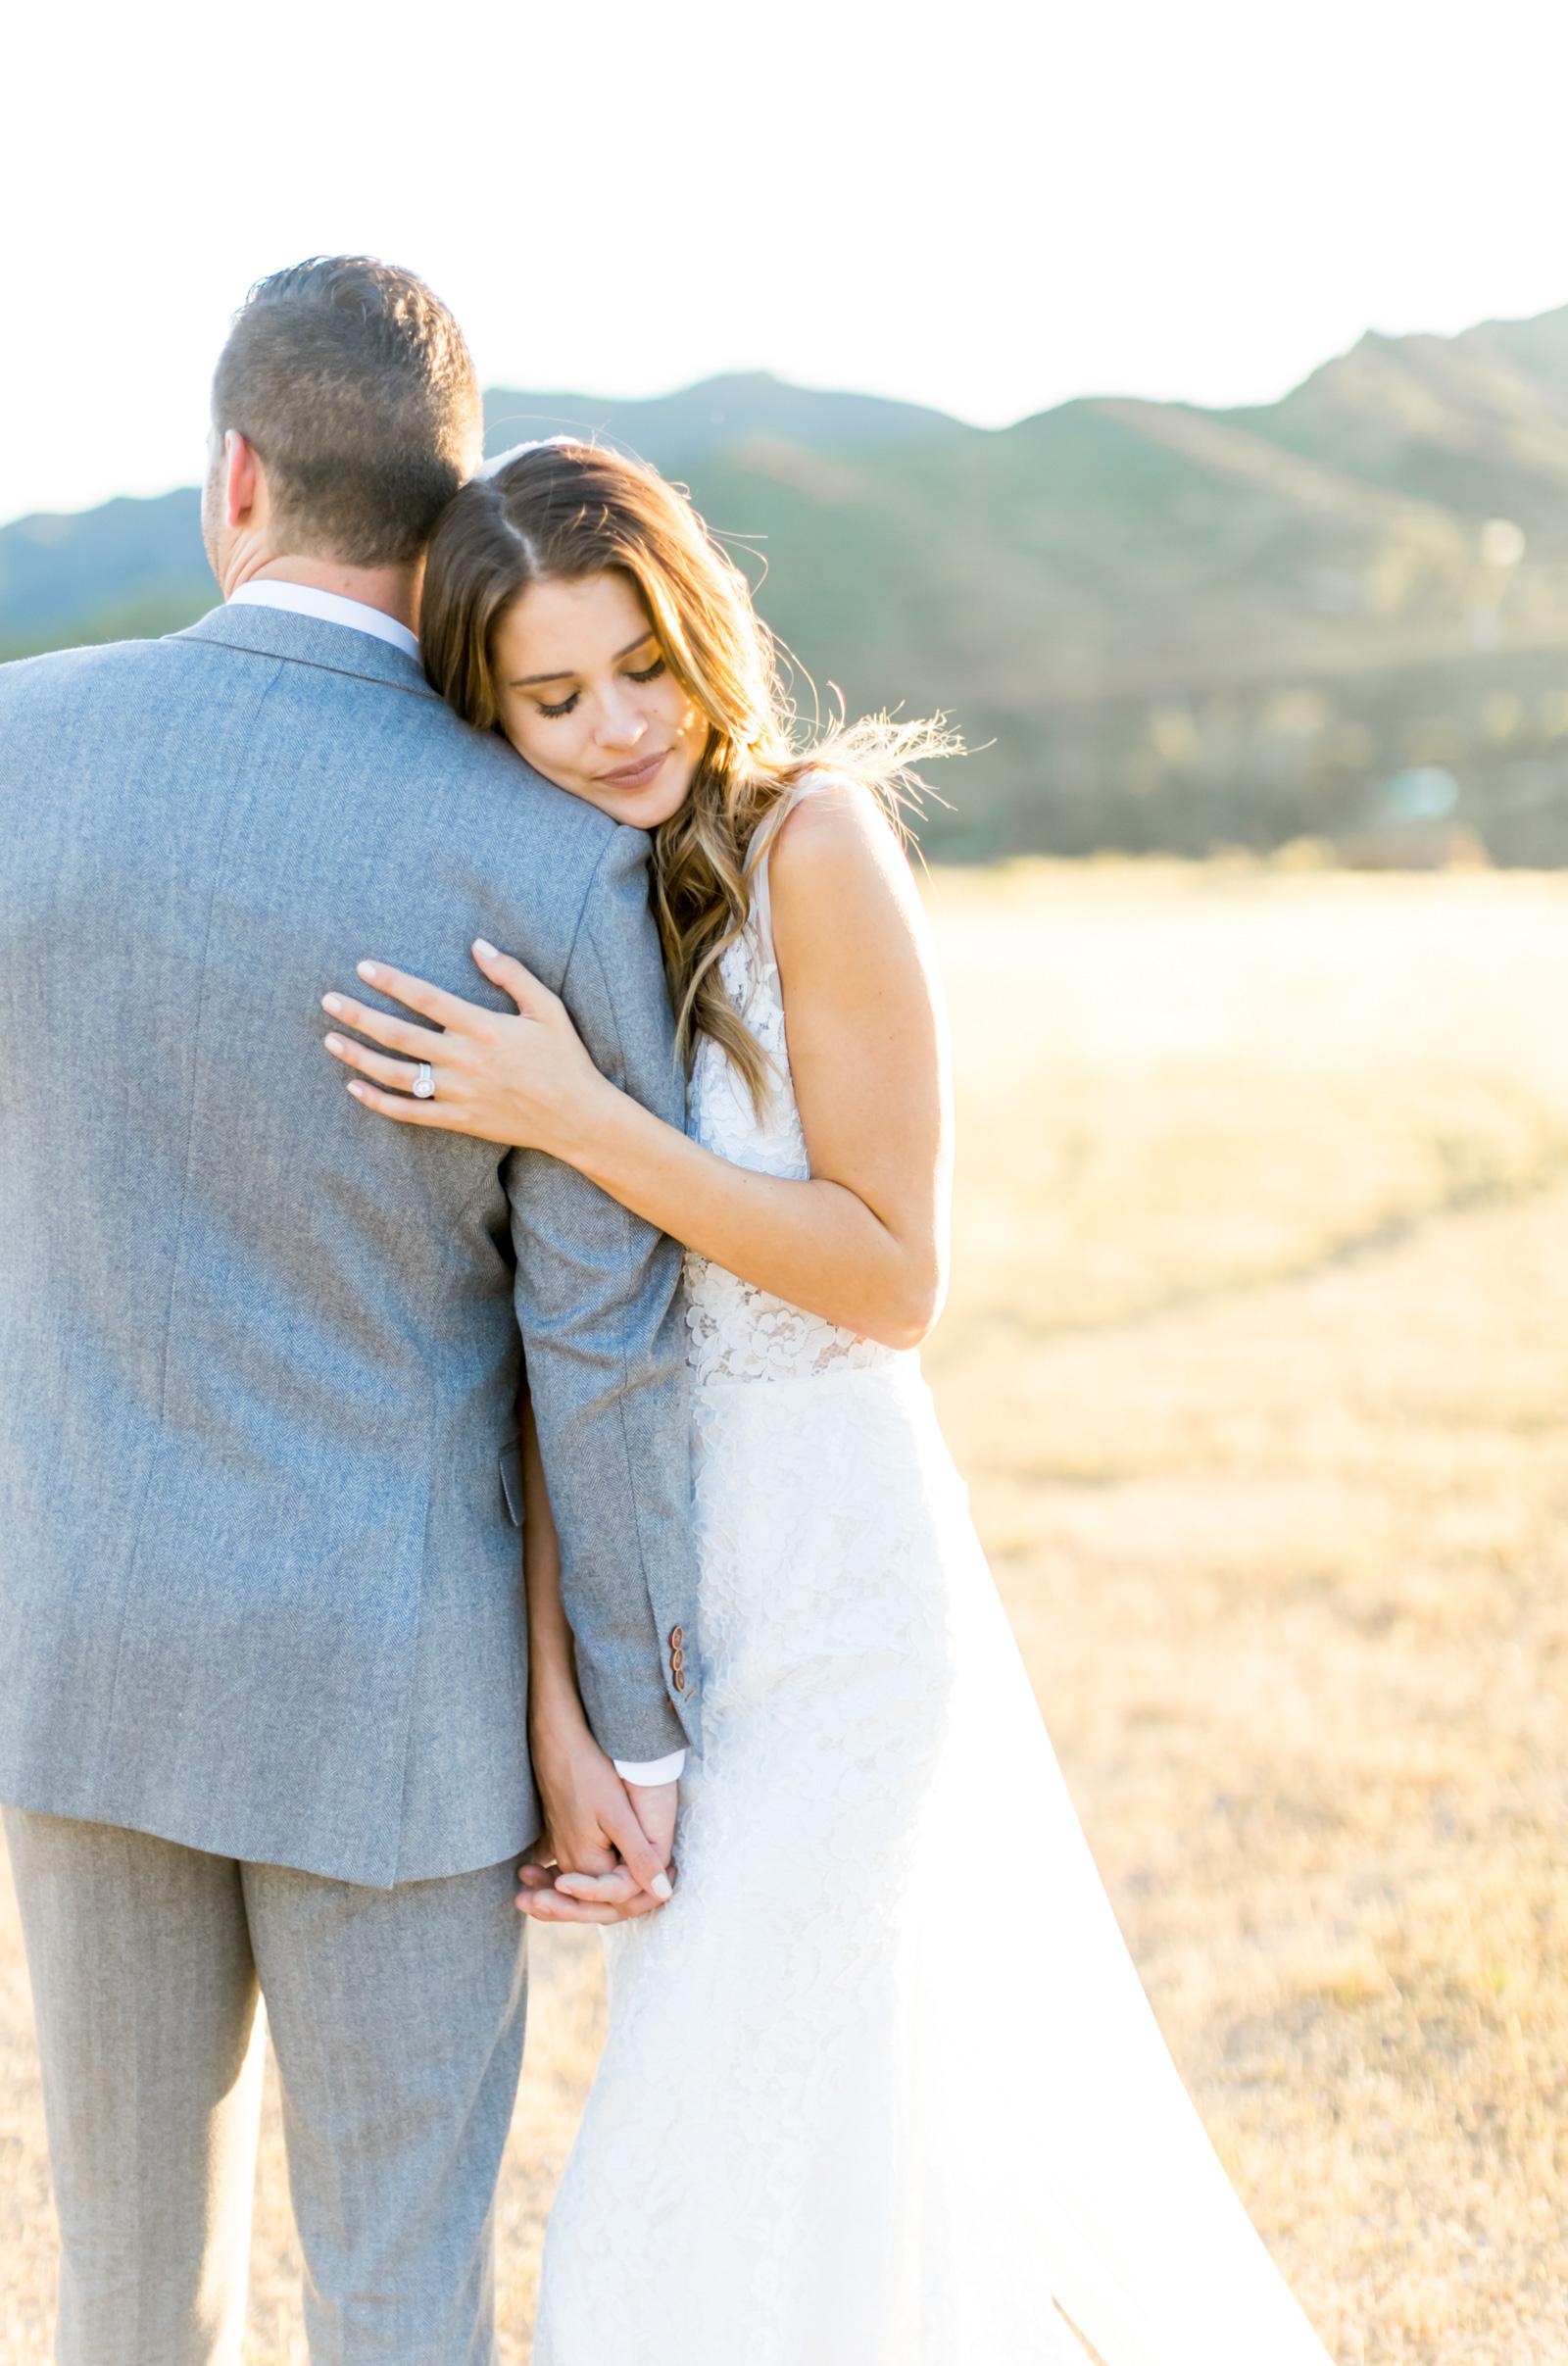 Triunfo-Creek-Malibu-Wedding-Natalie-Schutt-Photography-Couture-Events-Style-Me-Pretty_02.jpg